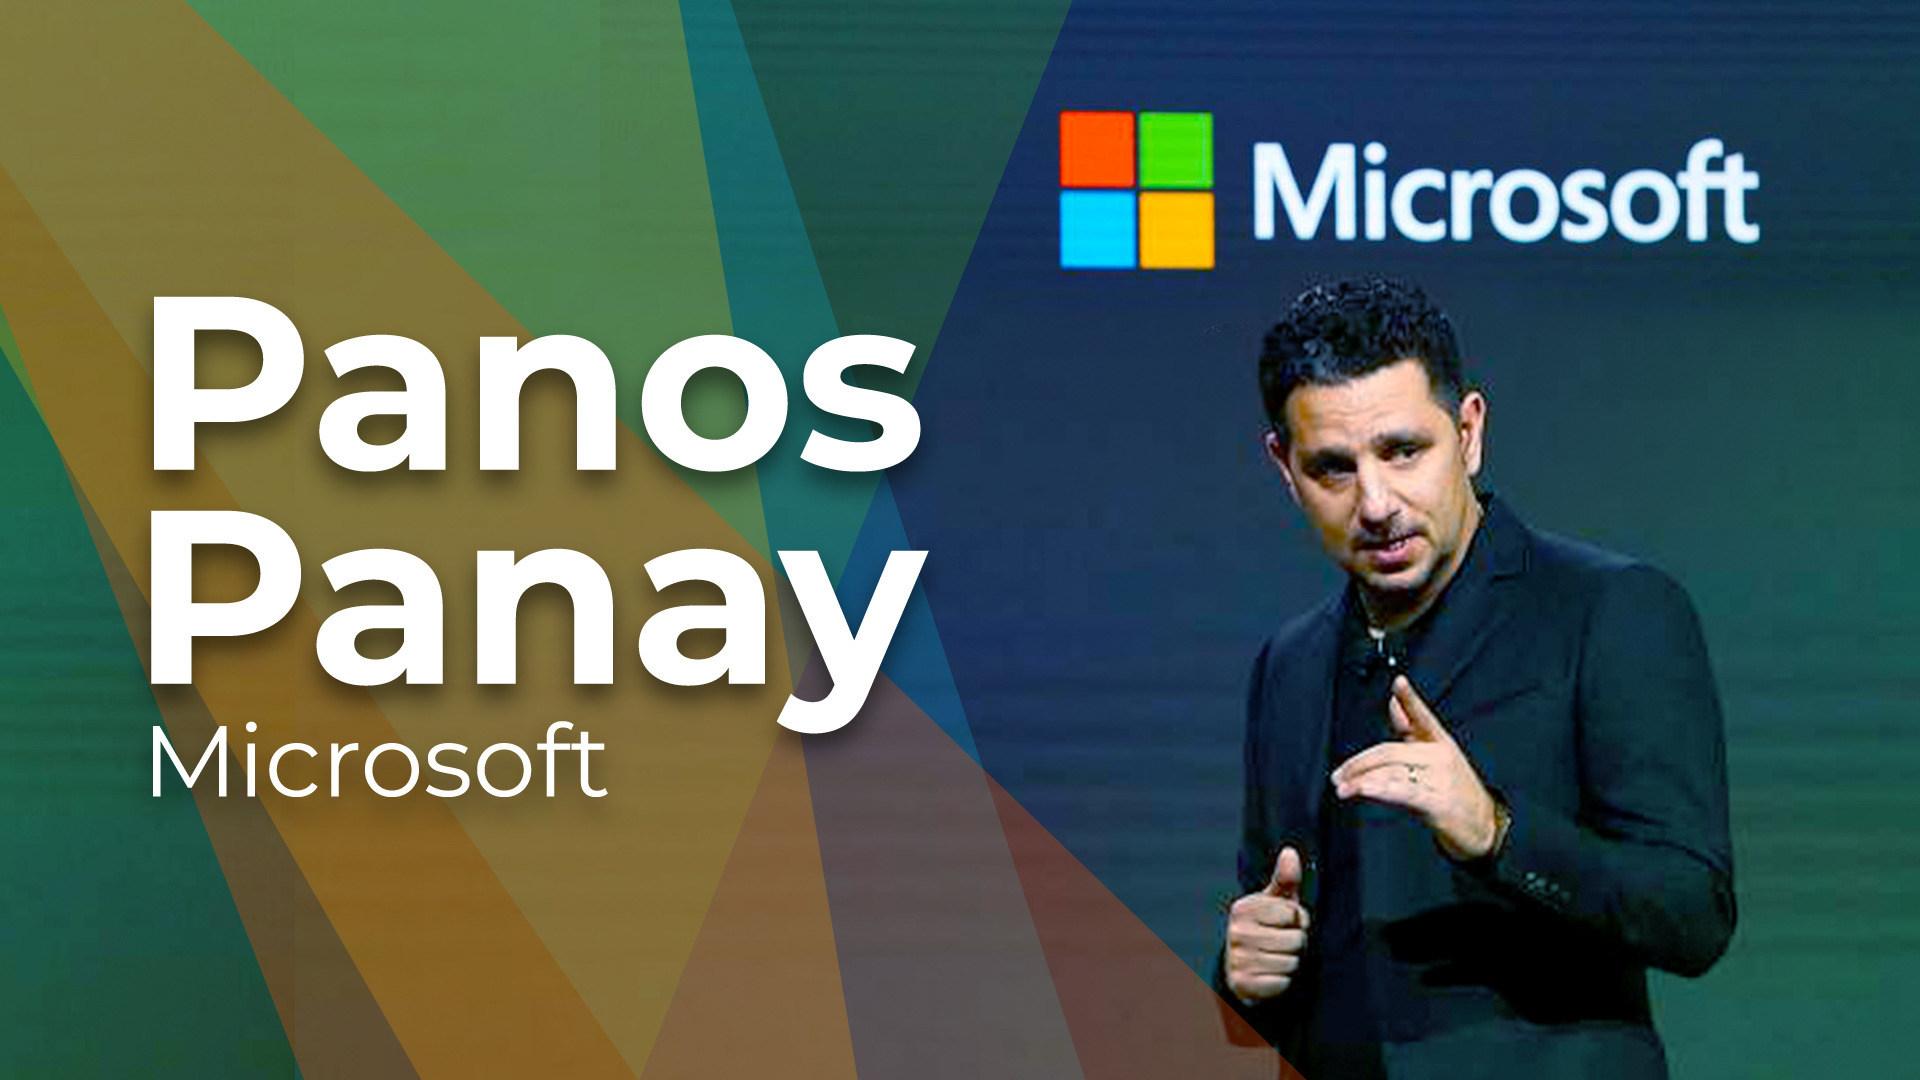 Microsoft, Surface, Microsoft Surface, Panos Panay, People, Leute, Microsoft Management